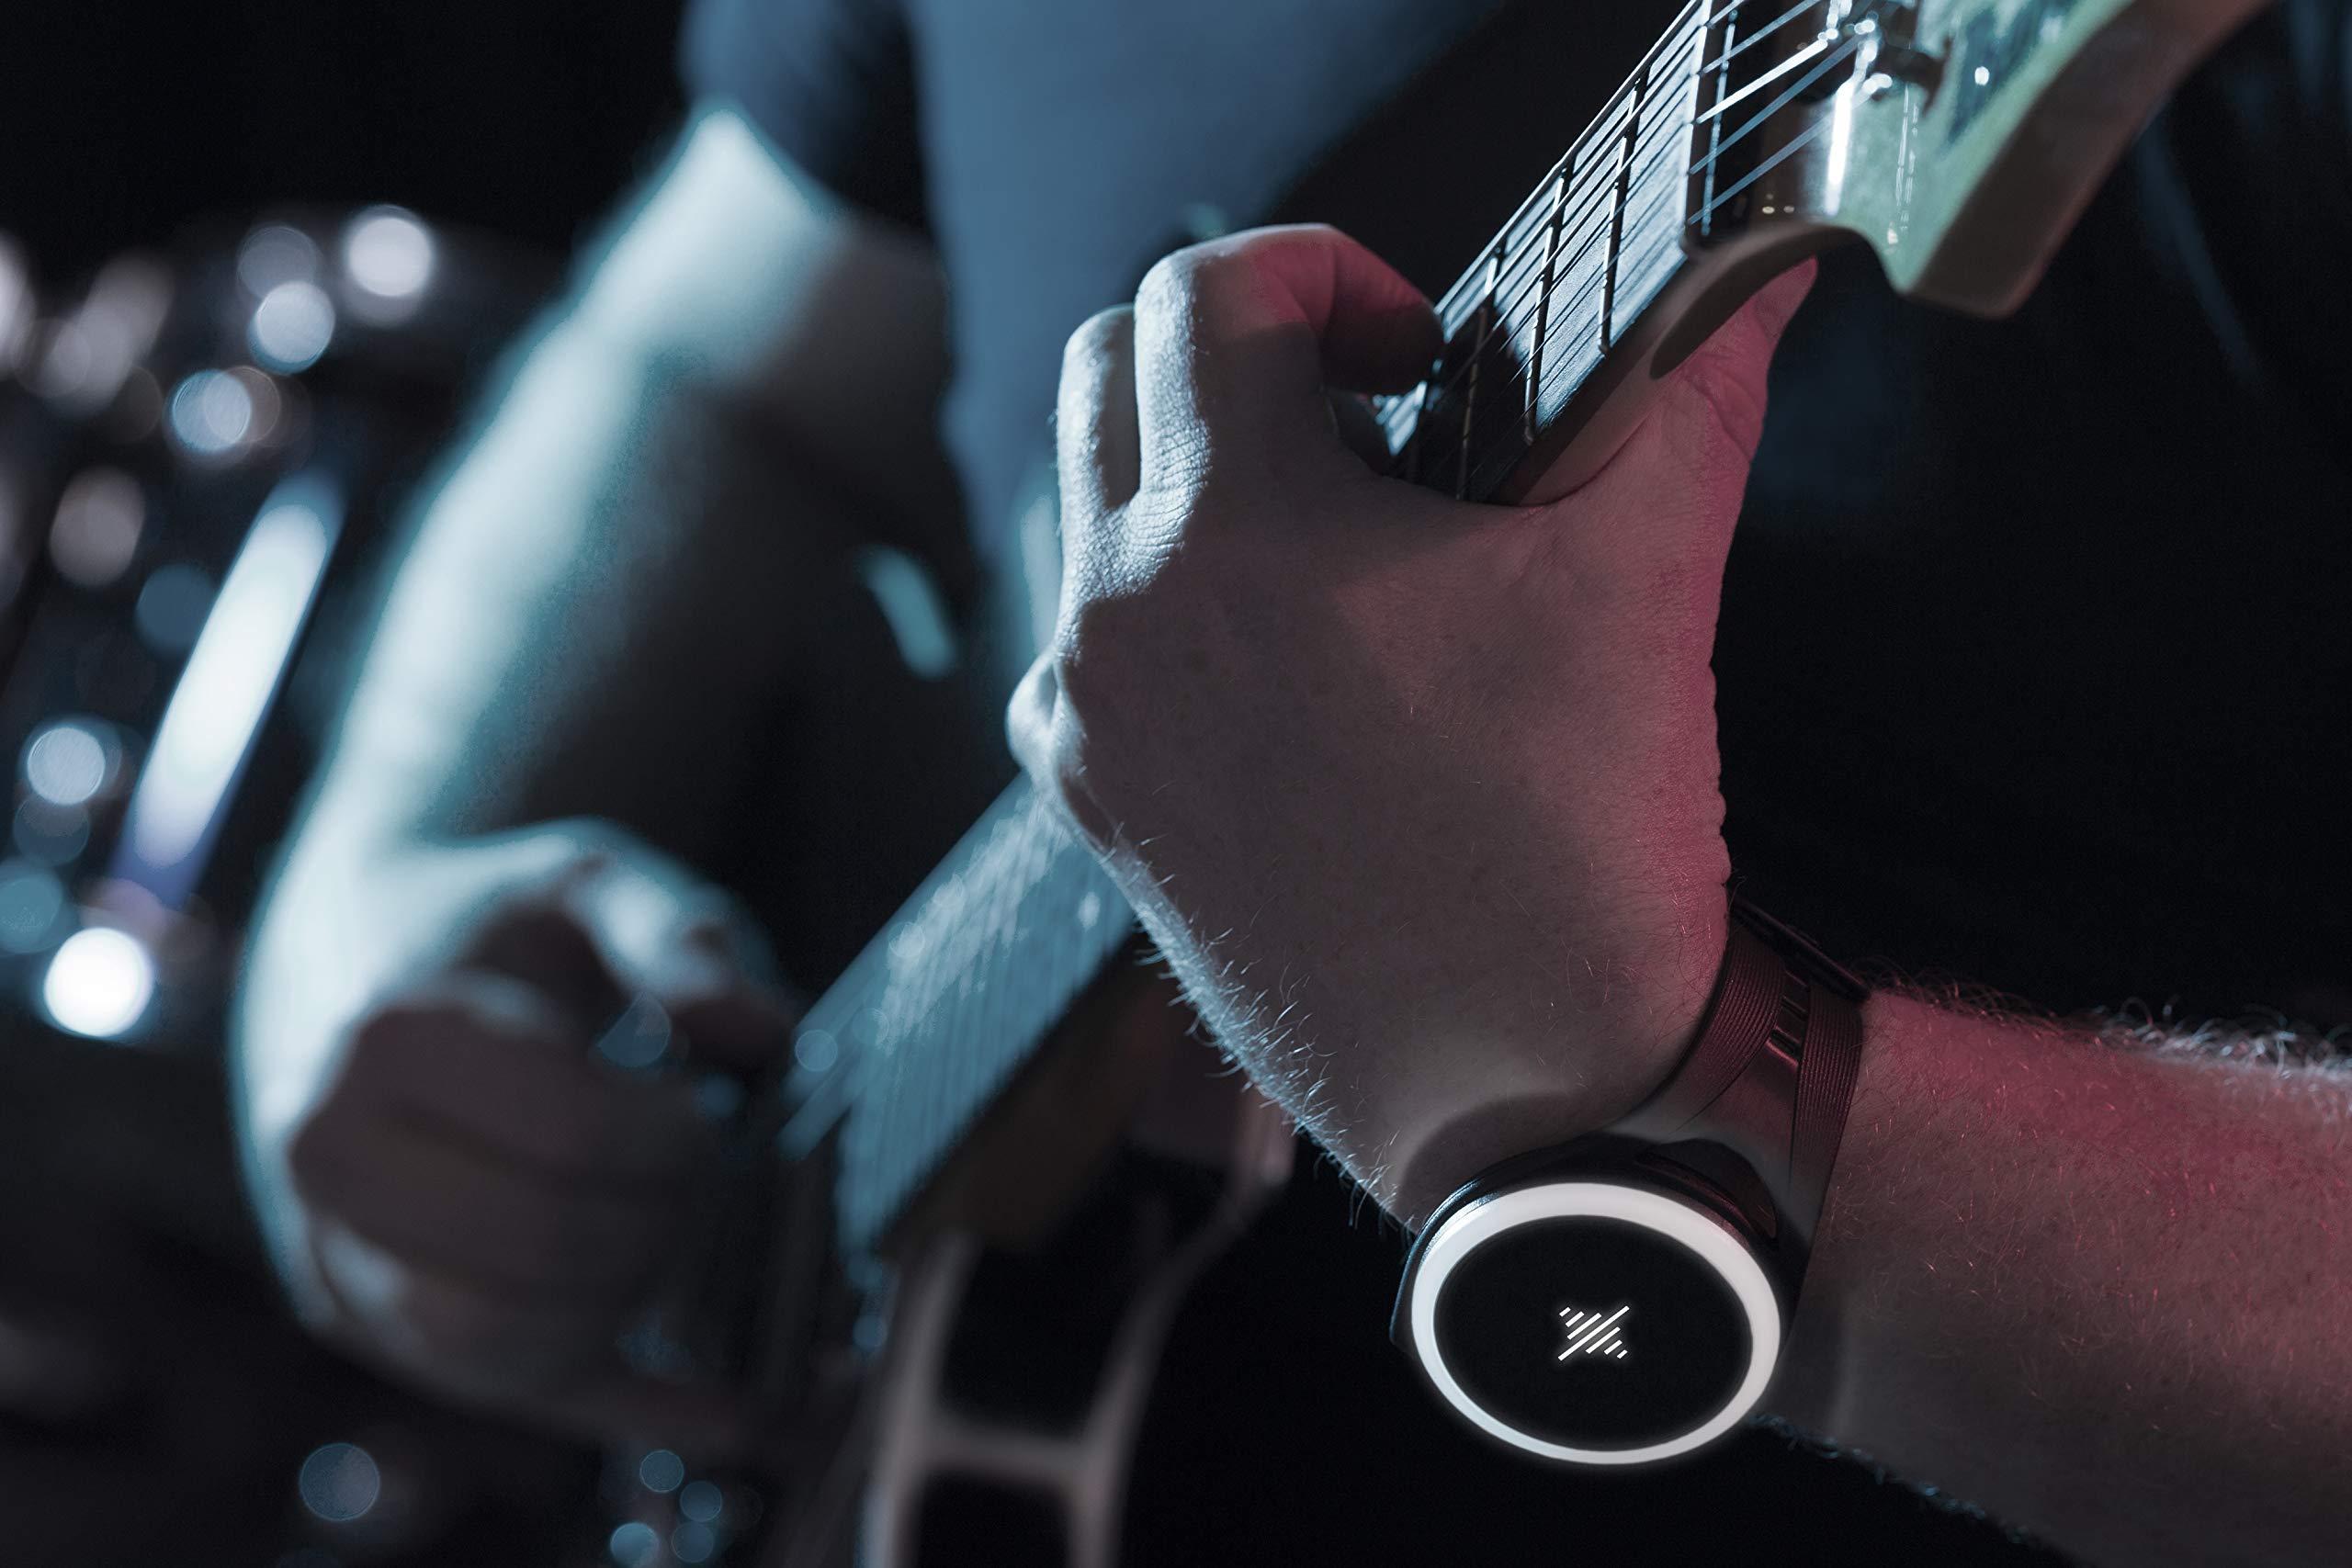 Soundbrenner Pulse | Smart, Vibrating & Wearable Metronome | Para ...